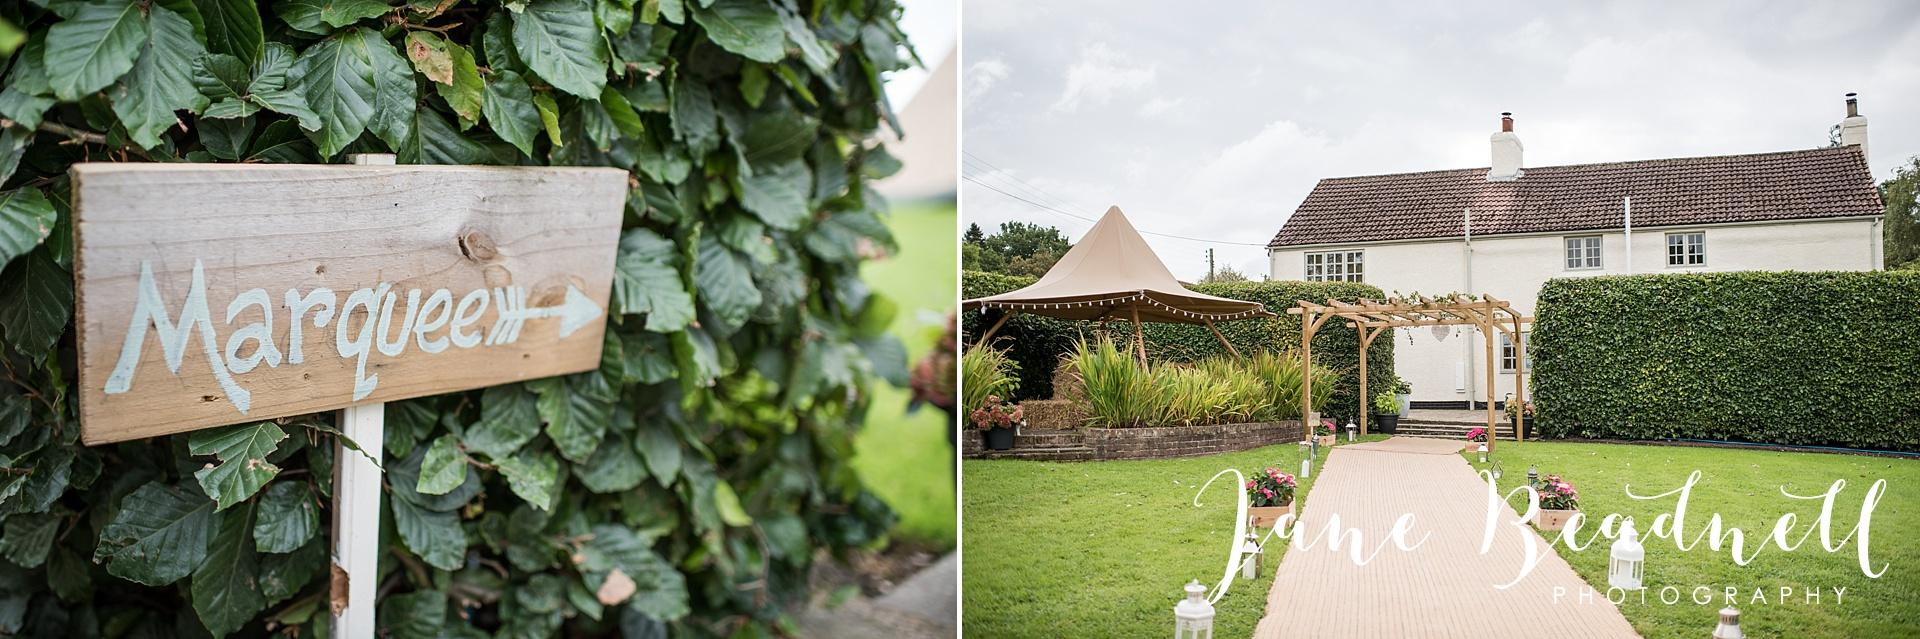 fine-art-wedding-photographer-jane-beadnell-yorkshire-wedding-photographer_0002